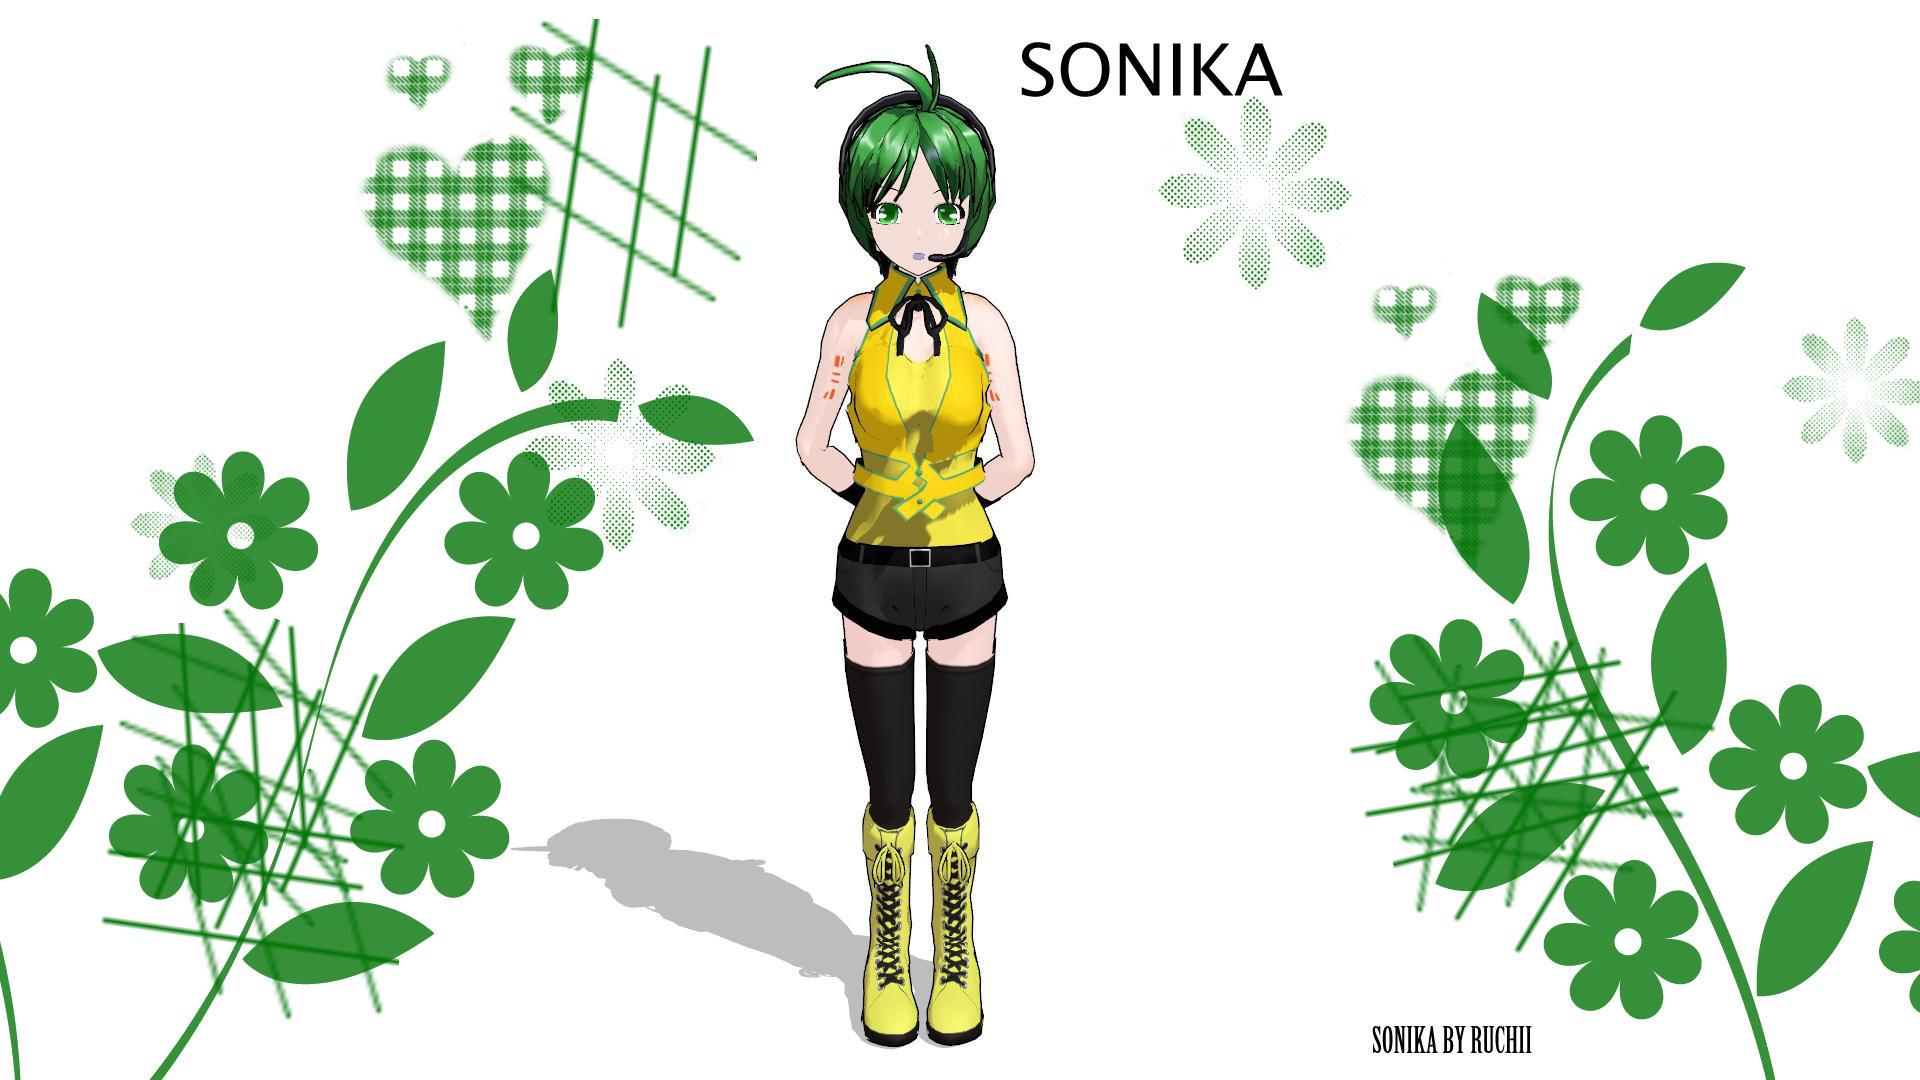 Sonika - mmd model by RuchiiP